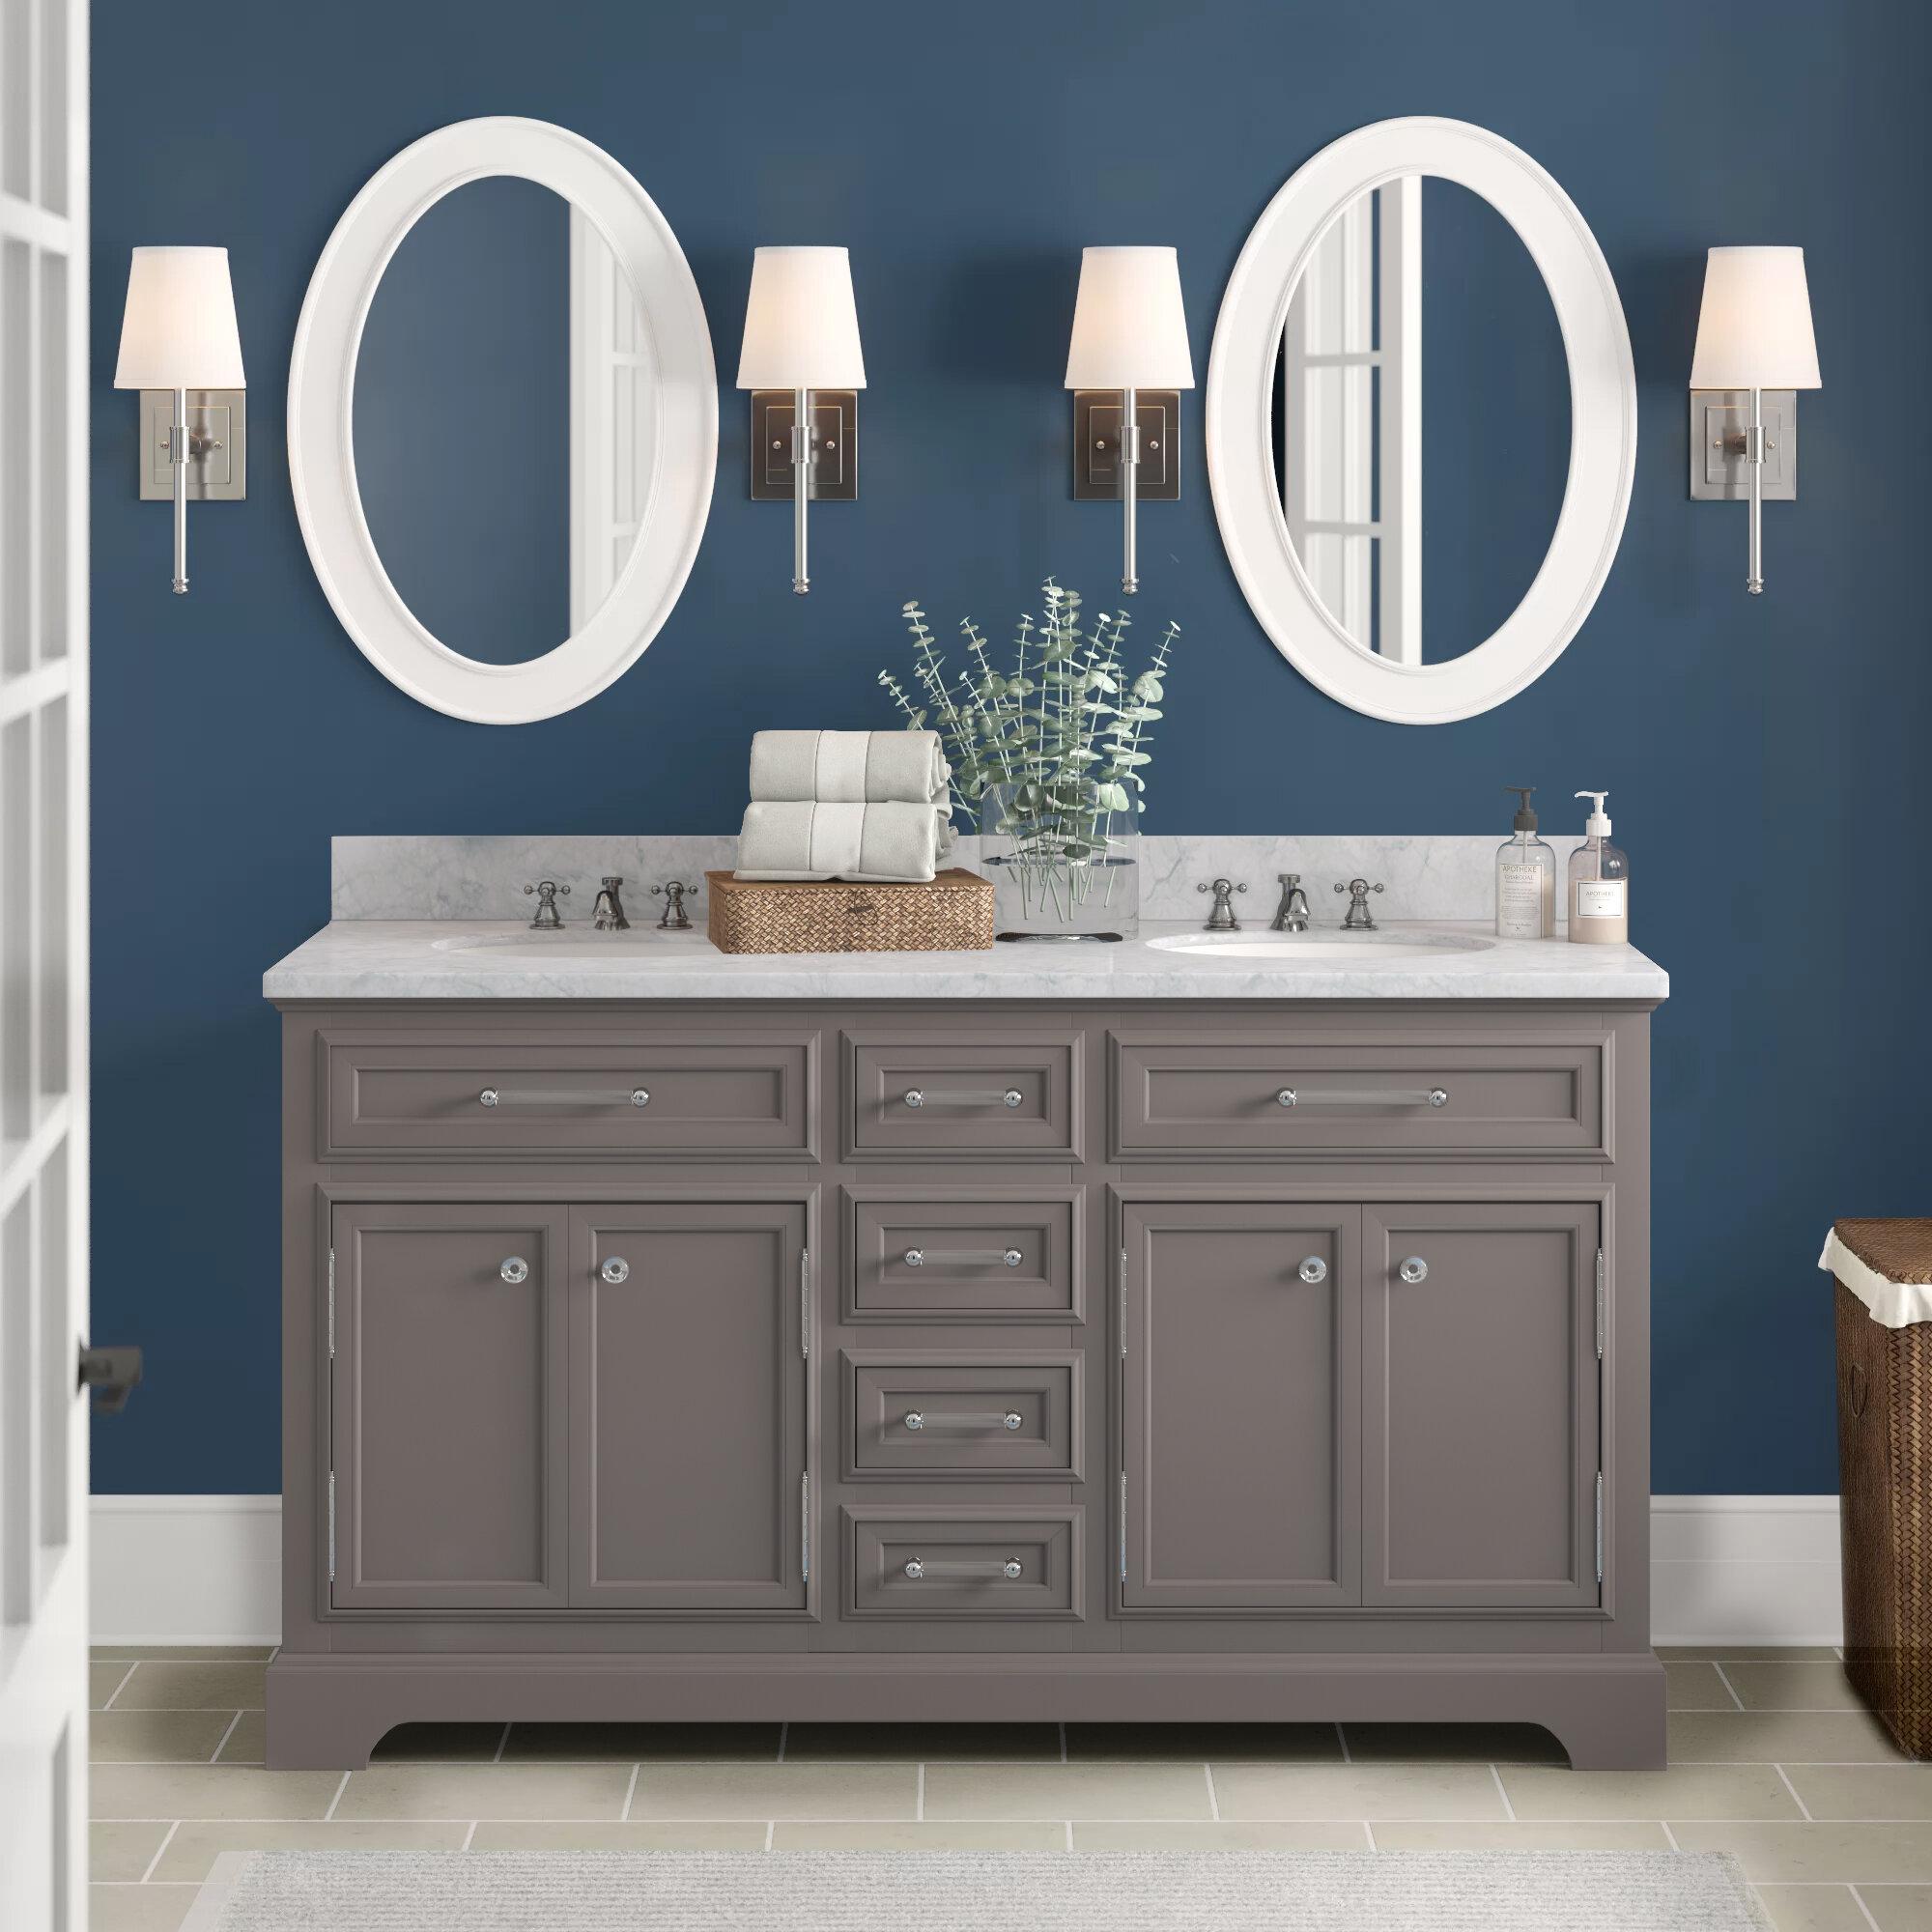 Contemporary Office Interior Design, Three Posts Bergin 60 Double Sink Bathroom Vanity Set With Mirror Reviews Wayfair